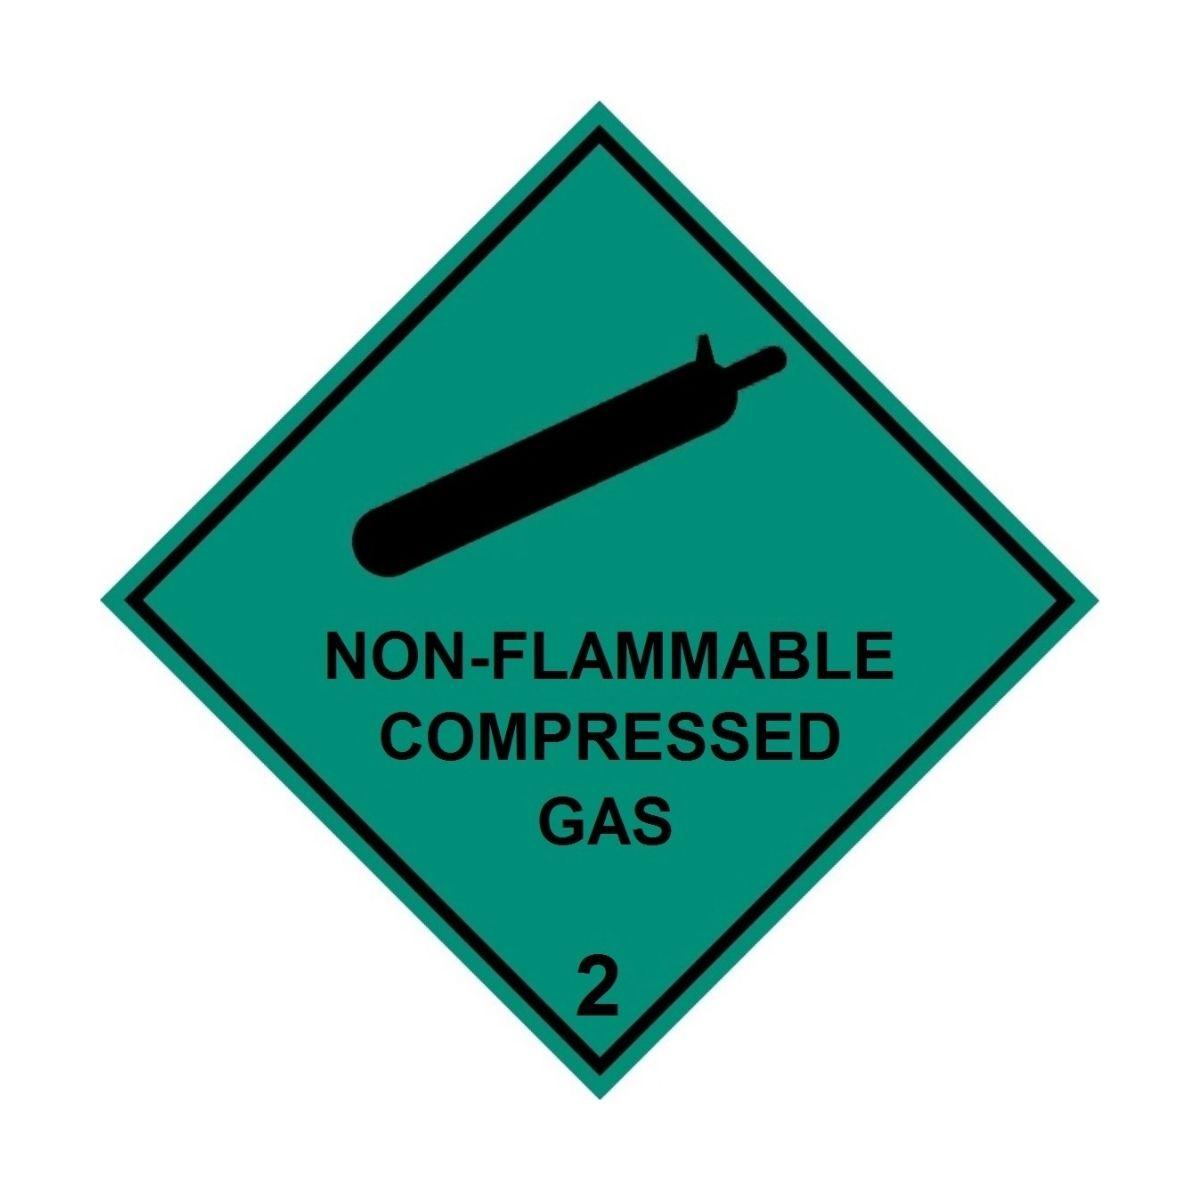 HD2211 UN Hazard Warning Diamond Class 2 Non-Flammable Compressed Gas